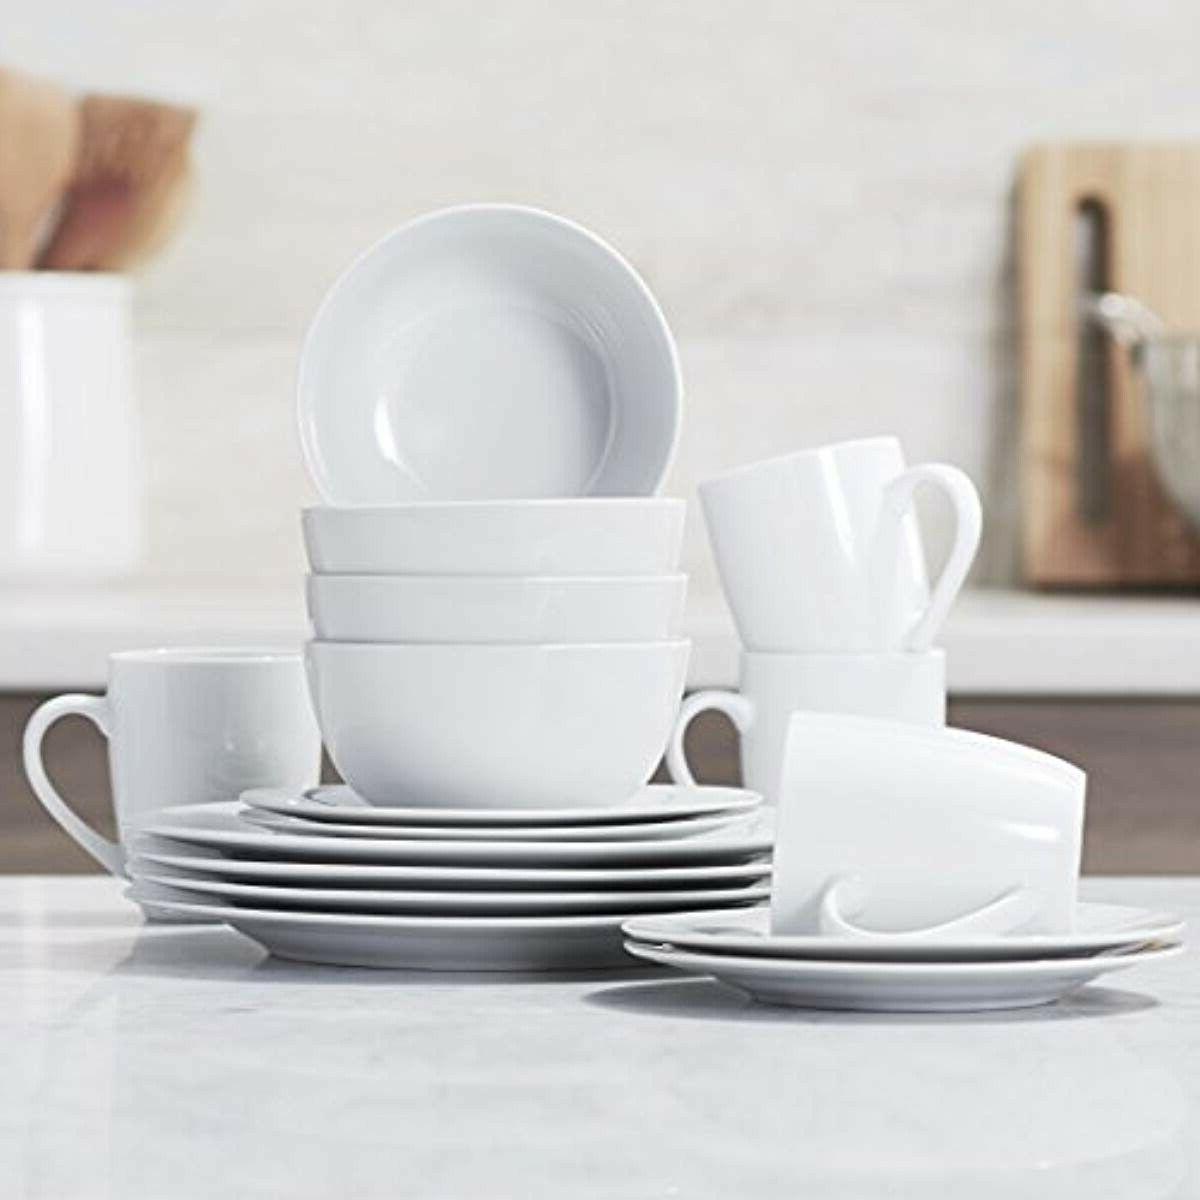 AmazonBasics Dinnerware Service 4